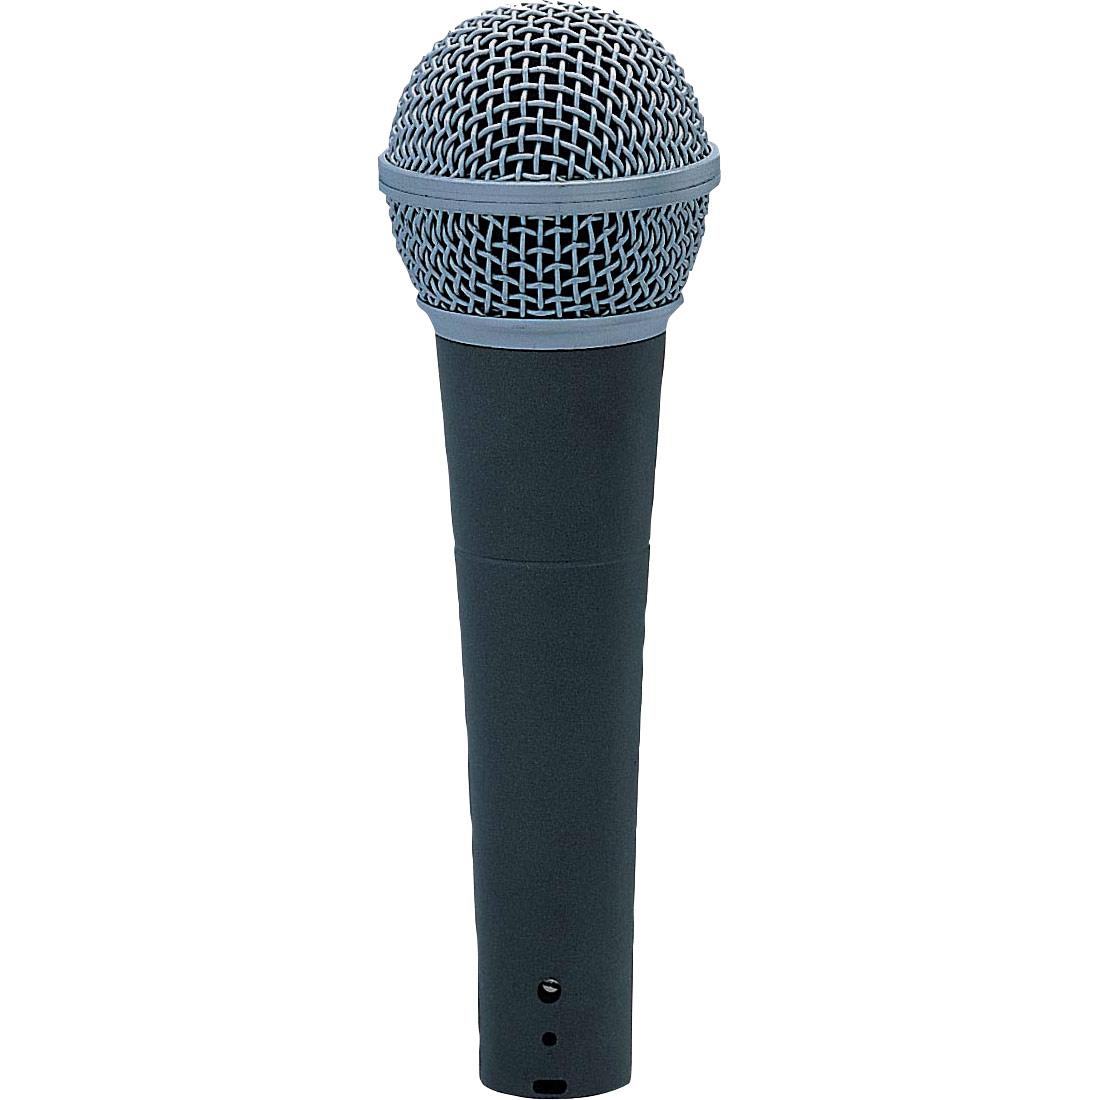 DJM-58 Microphone